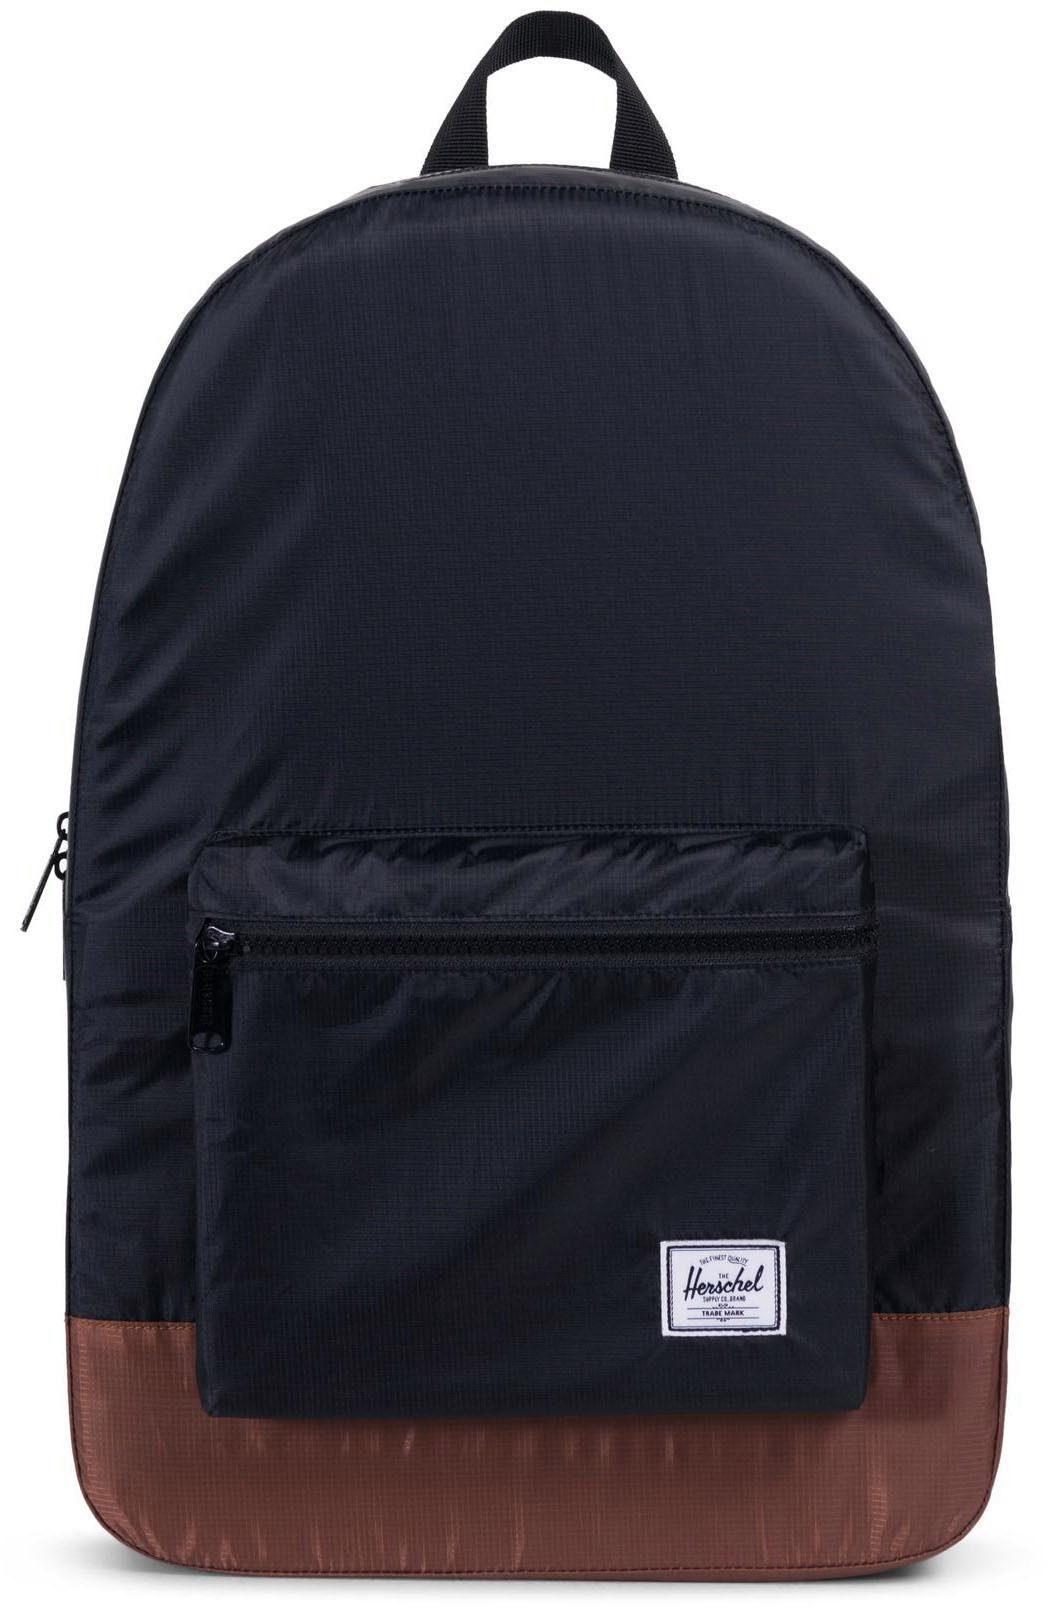 Herschel Rucksack, »Daypack Packable, Black/Tan Synthetic Leather«